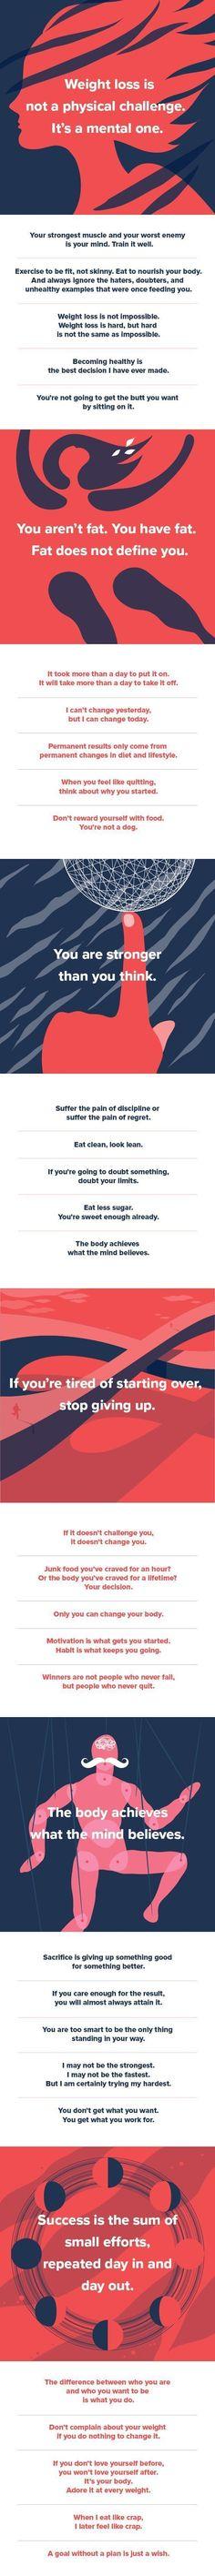 The Best Inspirational Quotes for Weight Loss https://www.musclesaurus.com https://www.musclesaurus.com